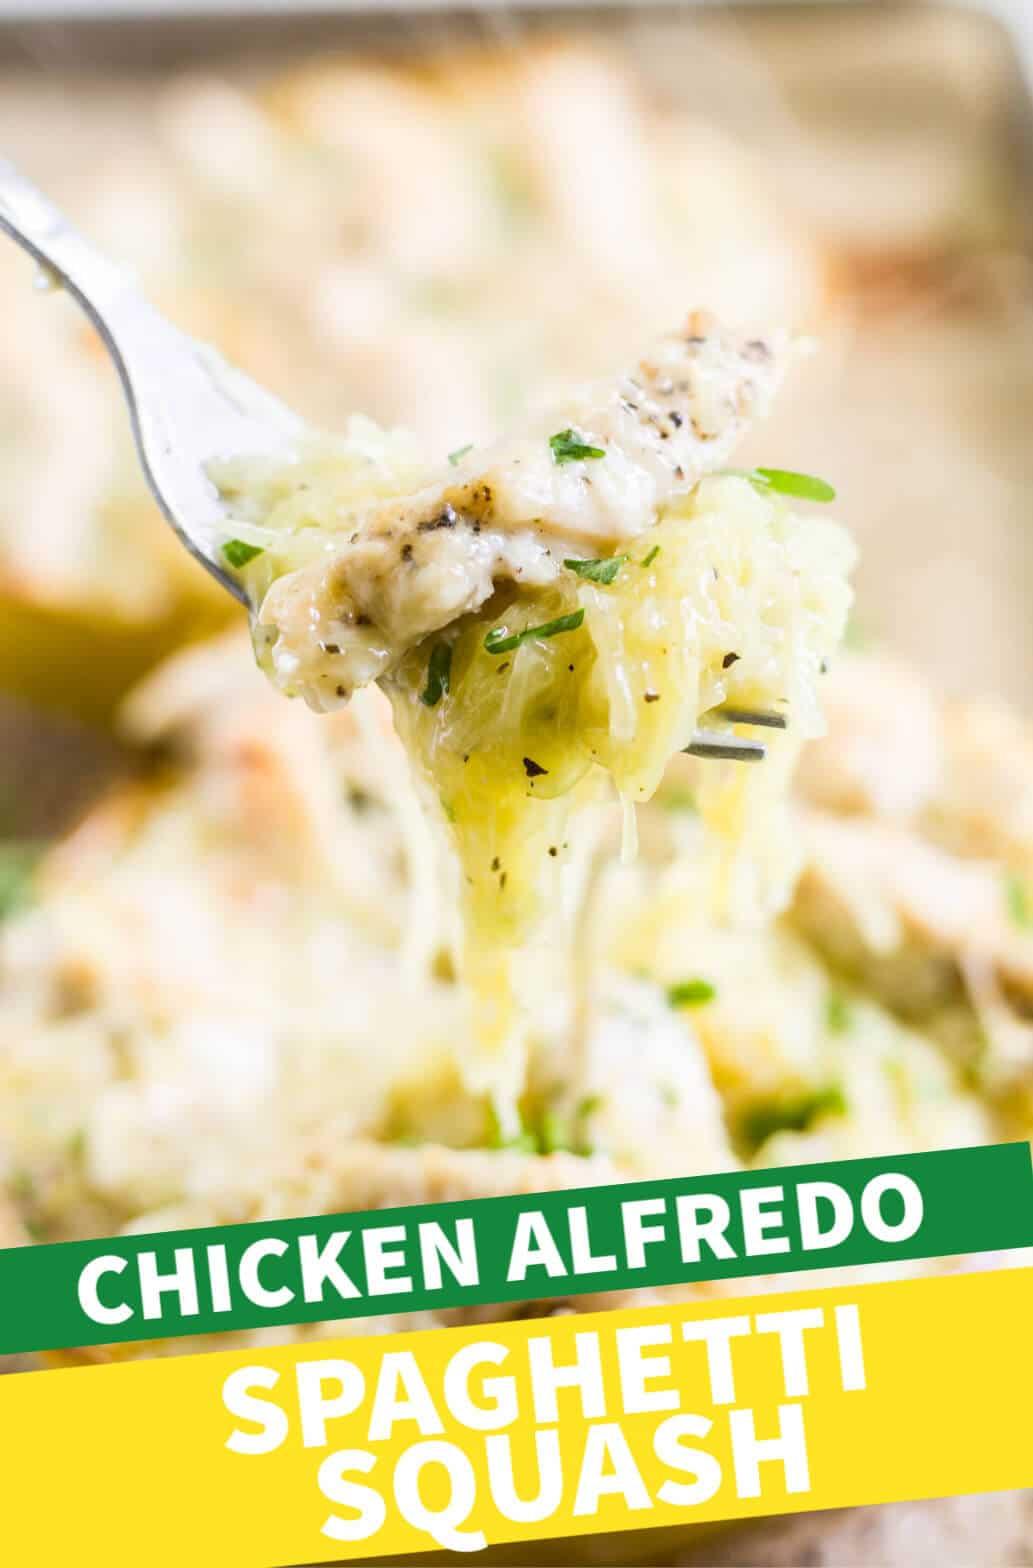 chicken alfredo stuffed spaghetti squash